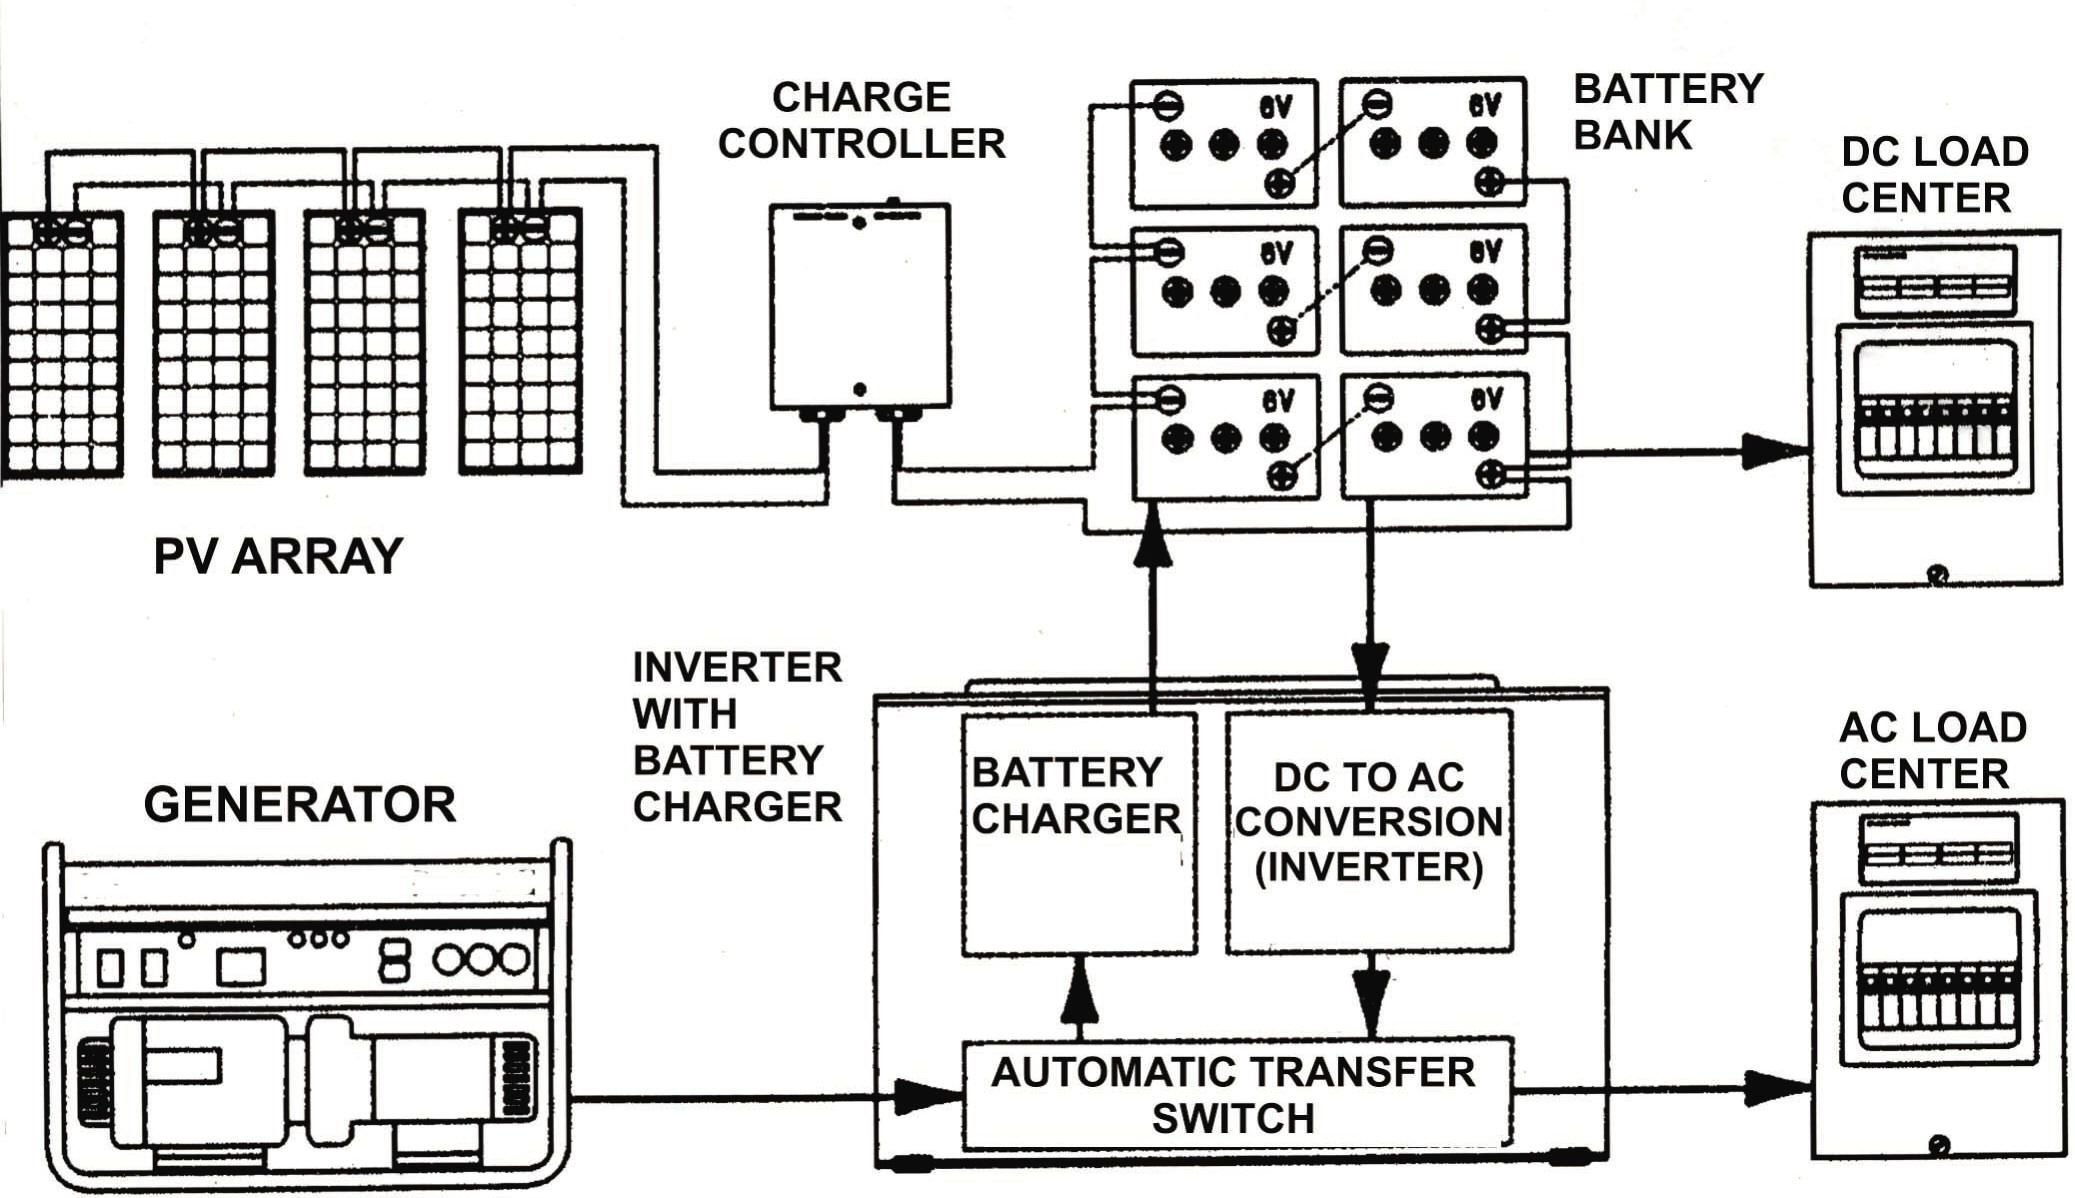 medium resolution of off grid solar generator wiring diagram simple wiring schema home generator wiring diagram off grid solar